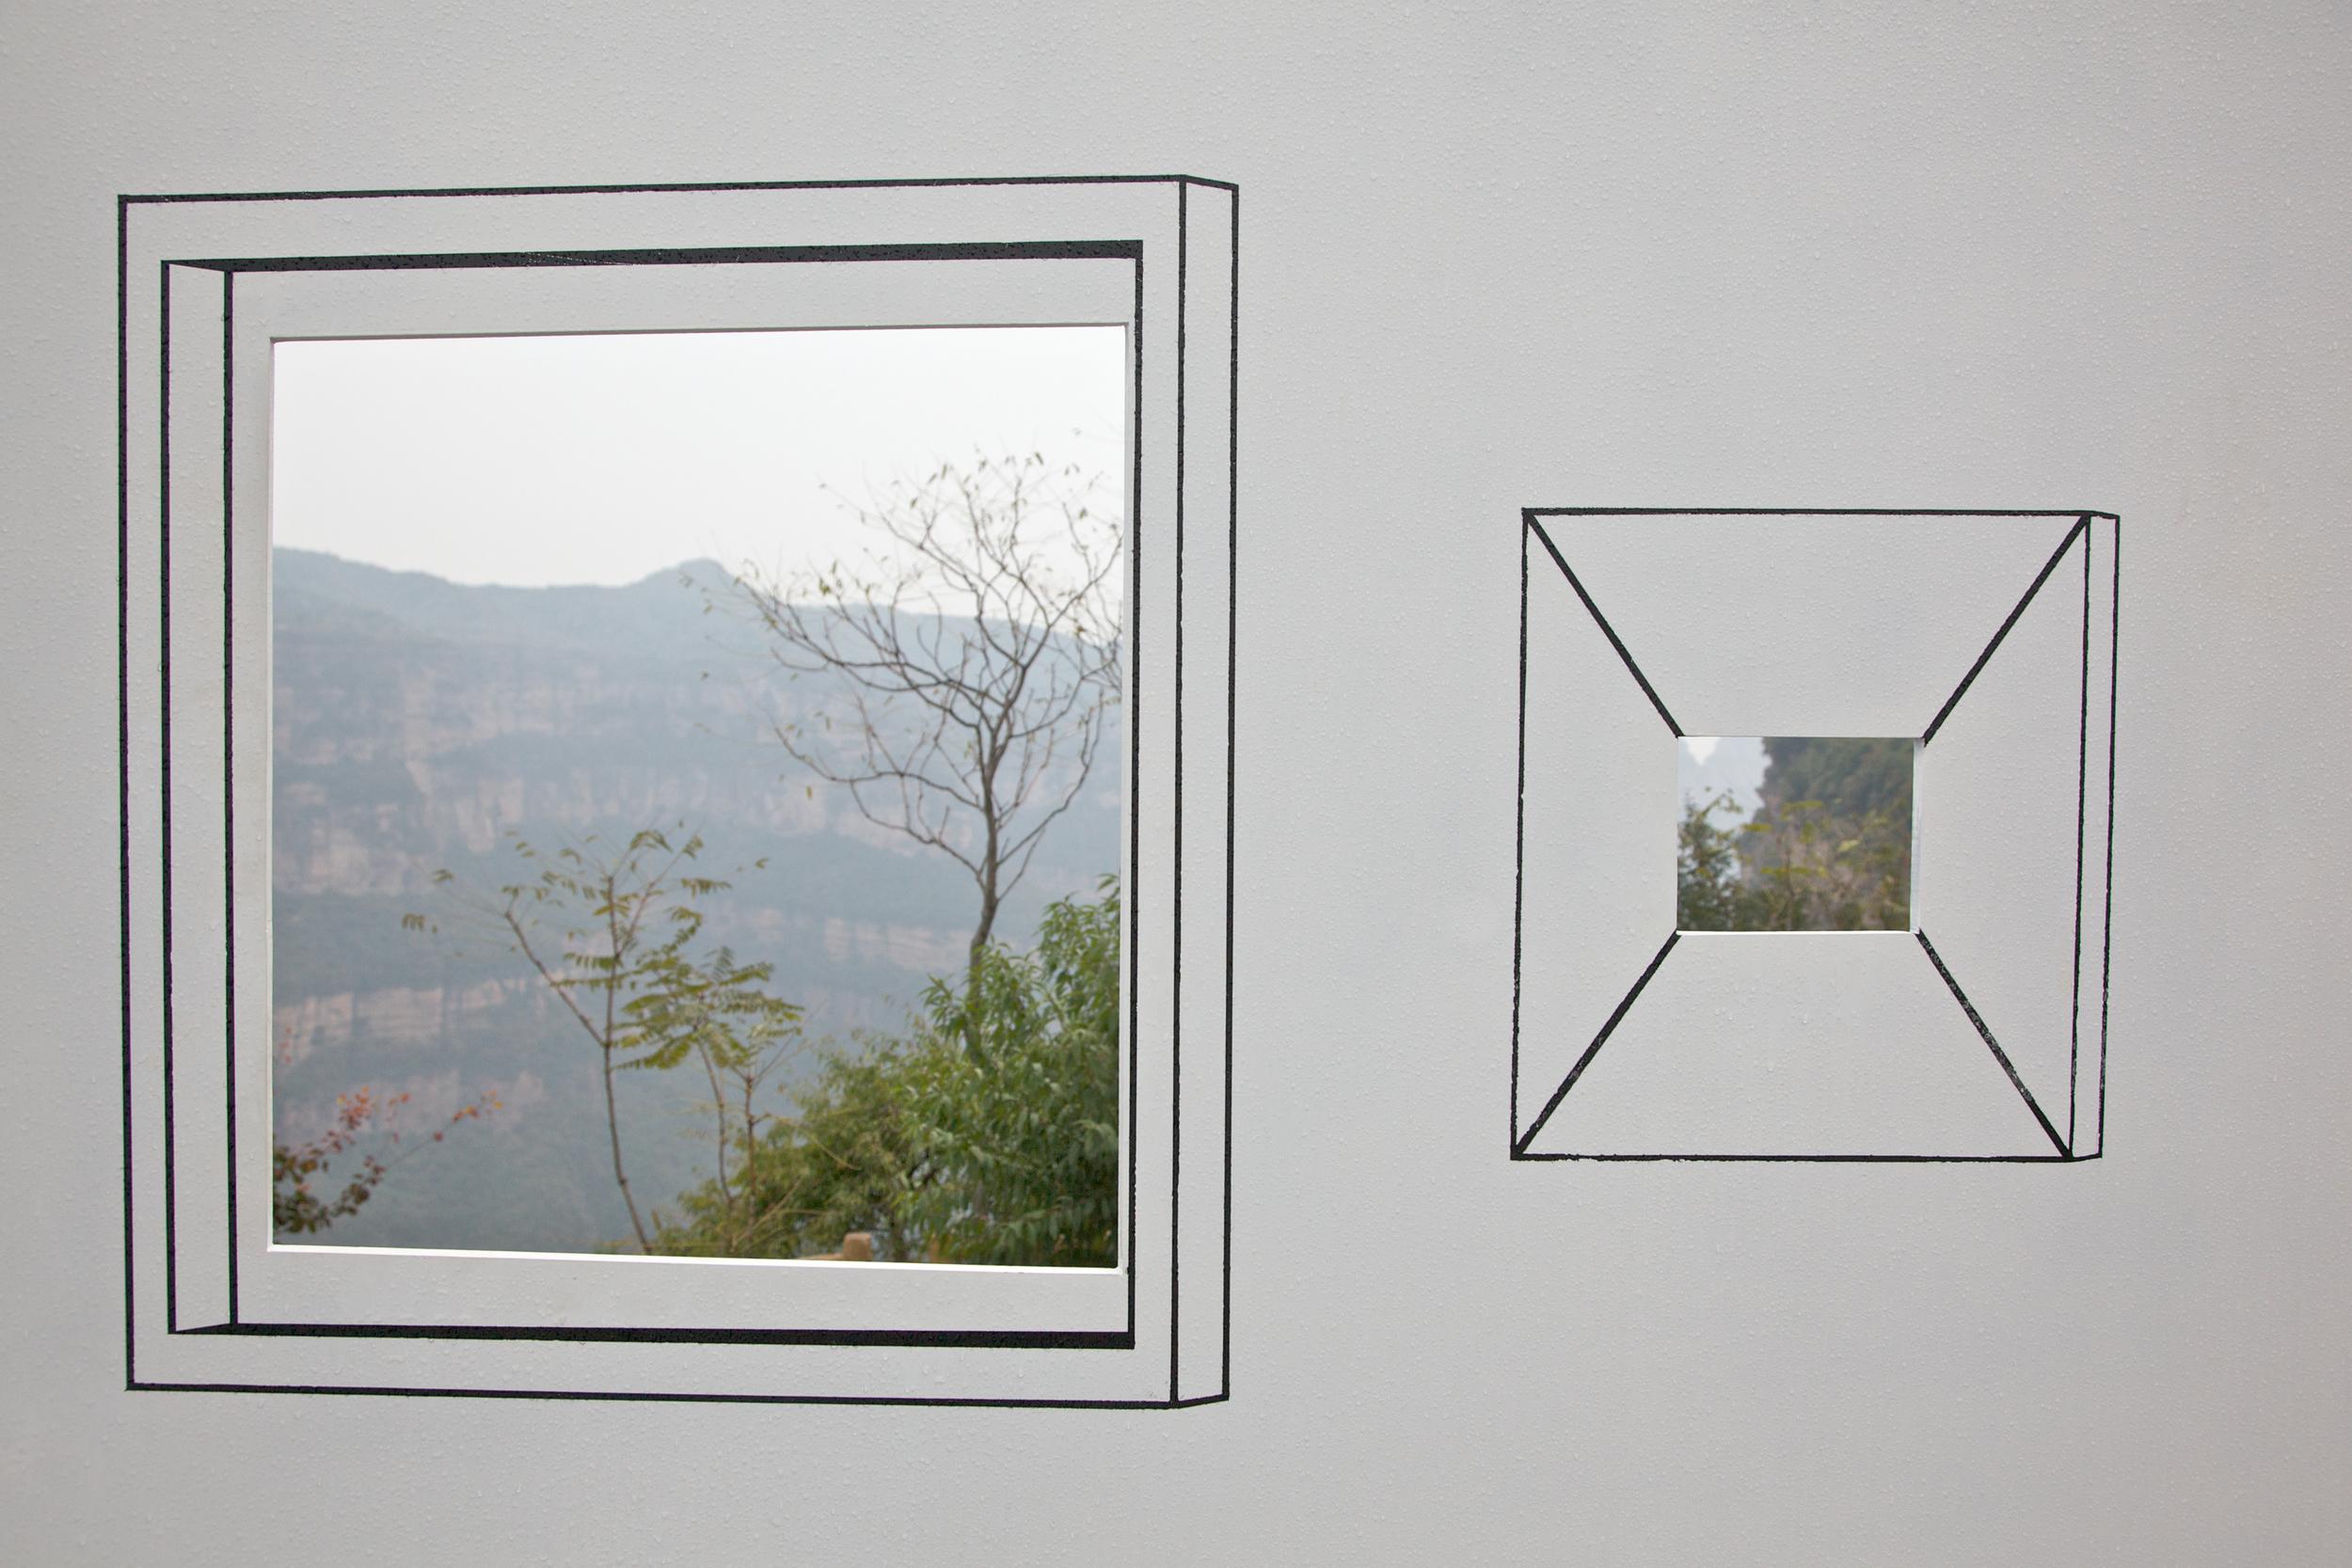 Ji Zhou 计洲, View on the Wall 墙上的风景, 2011, Installation view detail